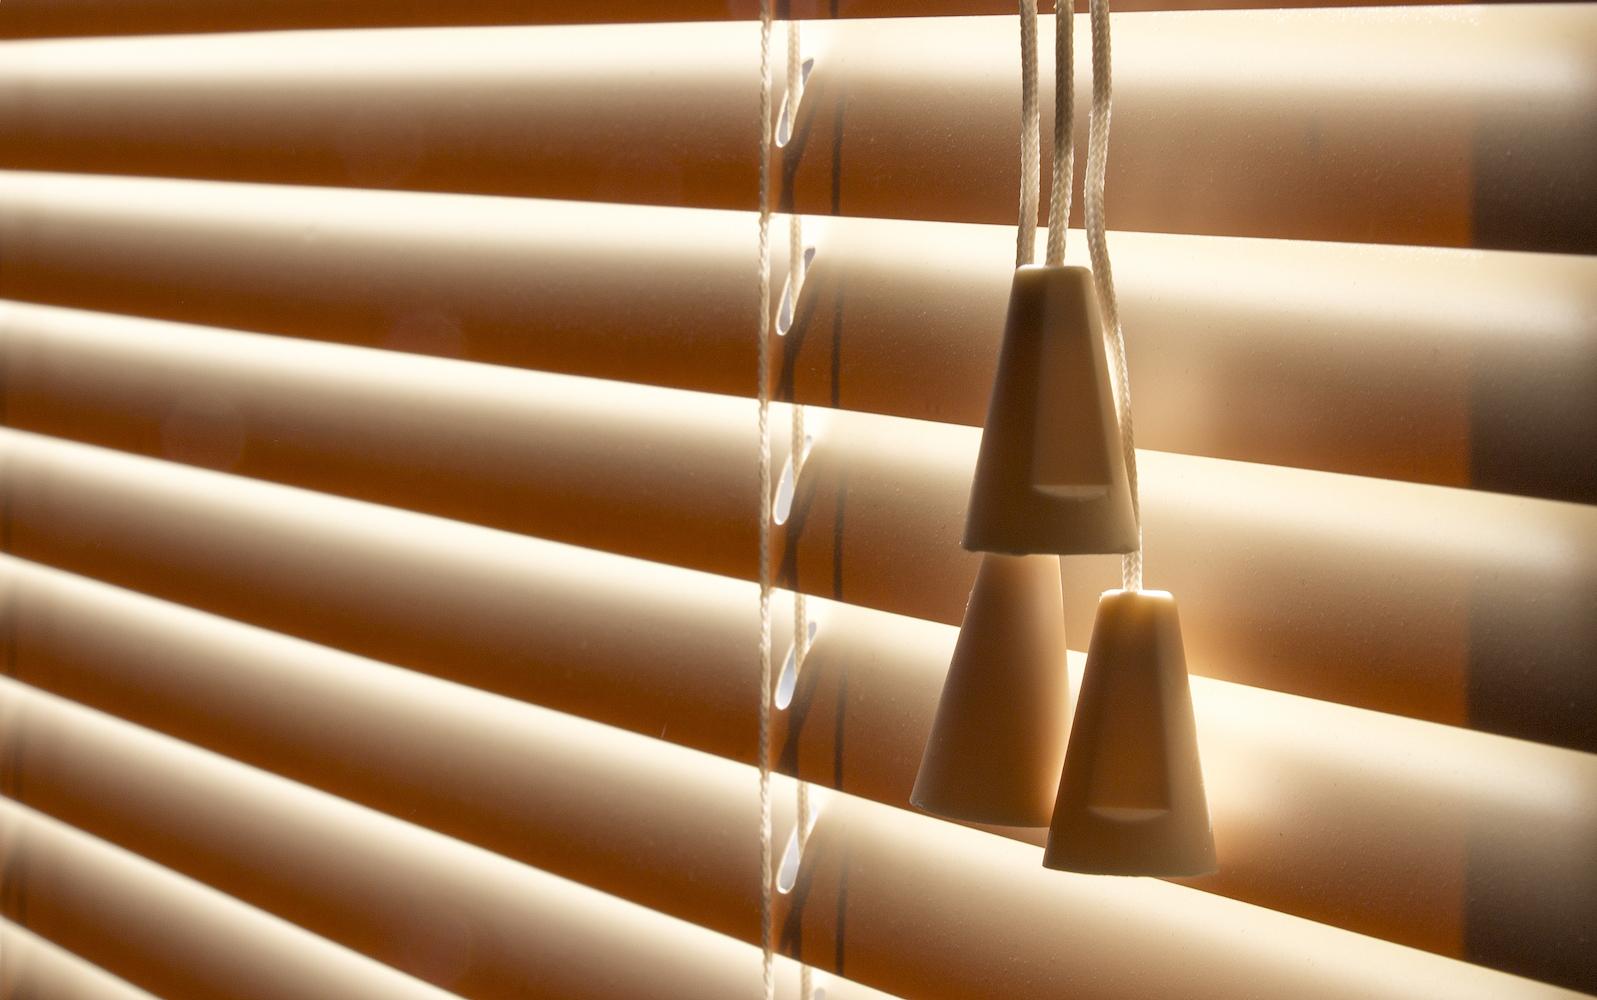 Window blinds pose a strangulation threat to children for 2 way window blinds